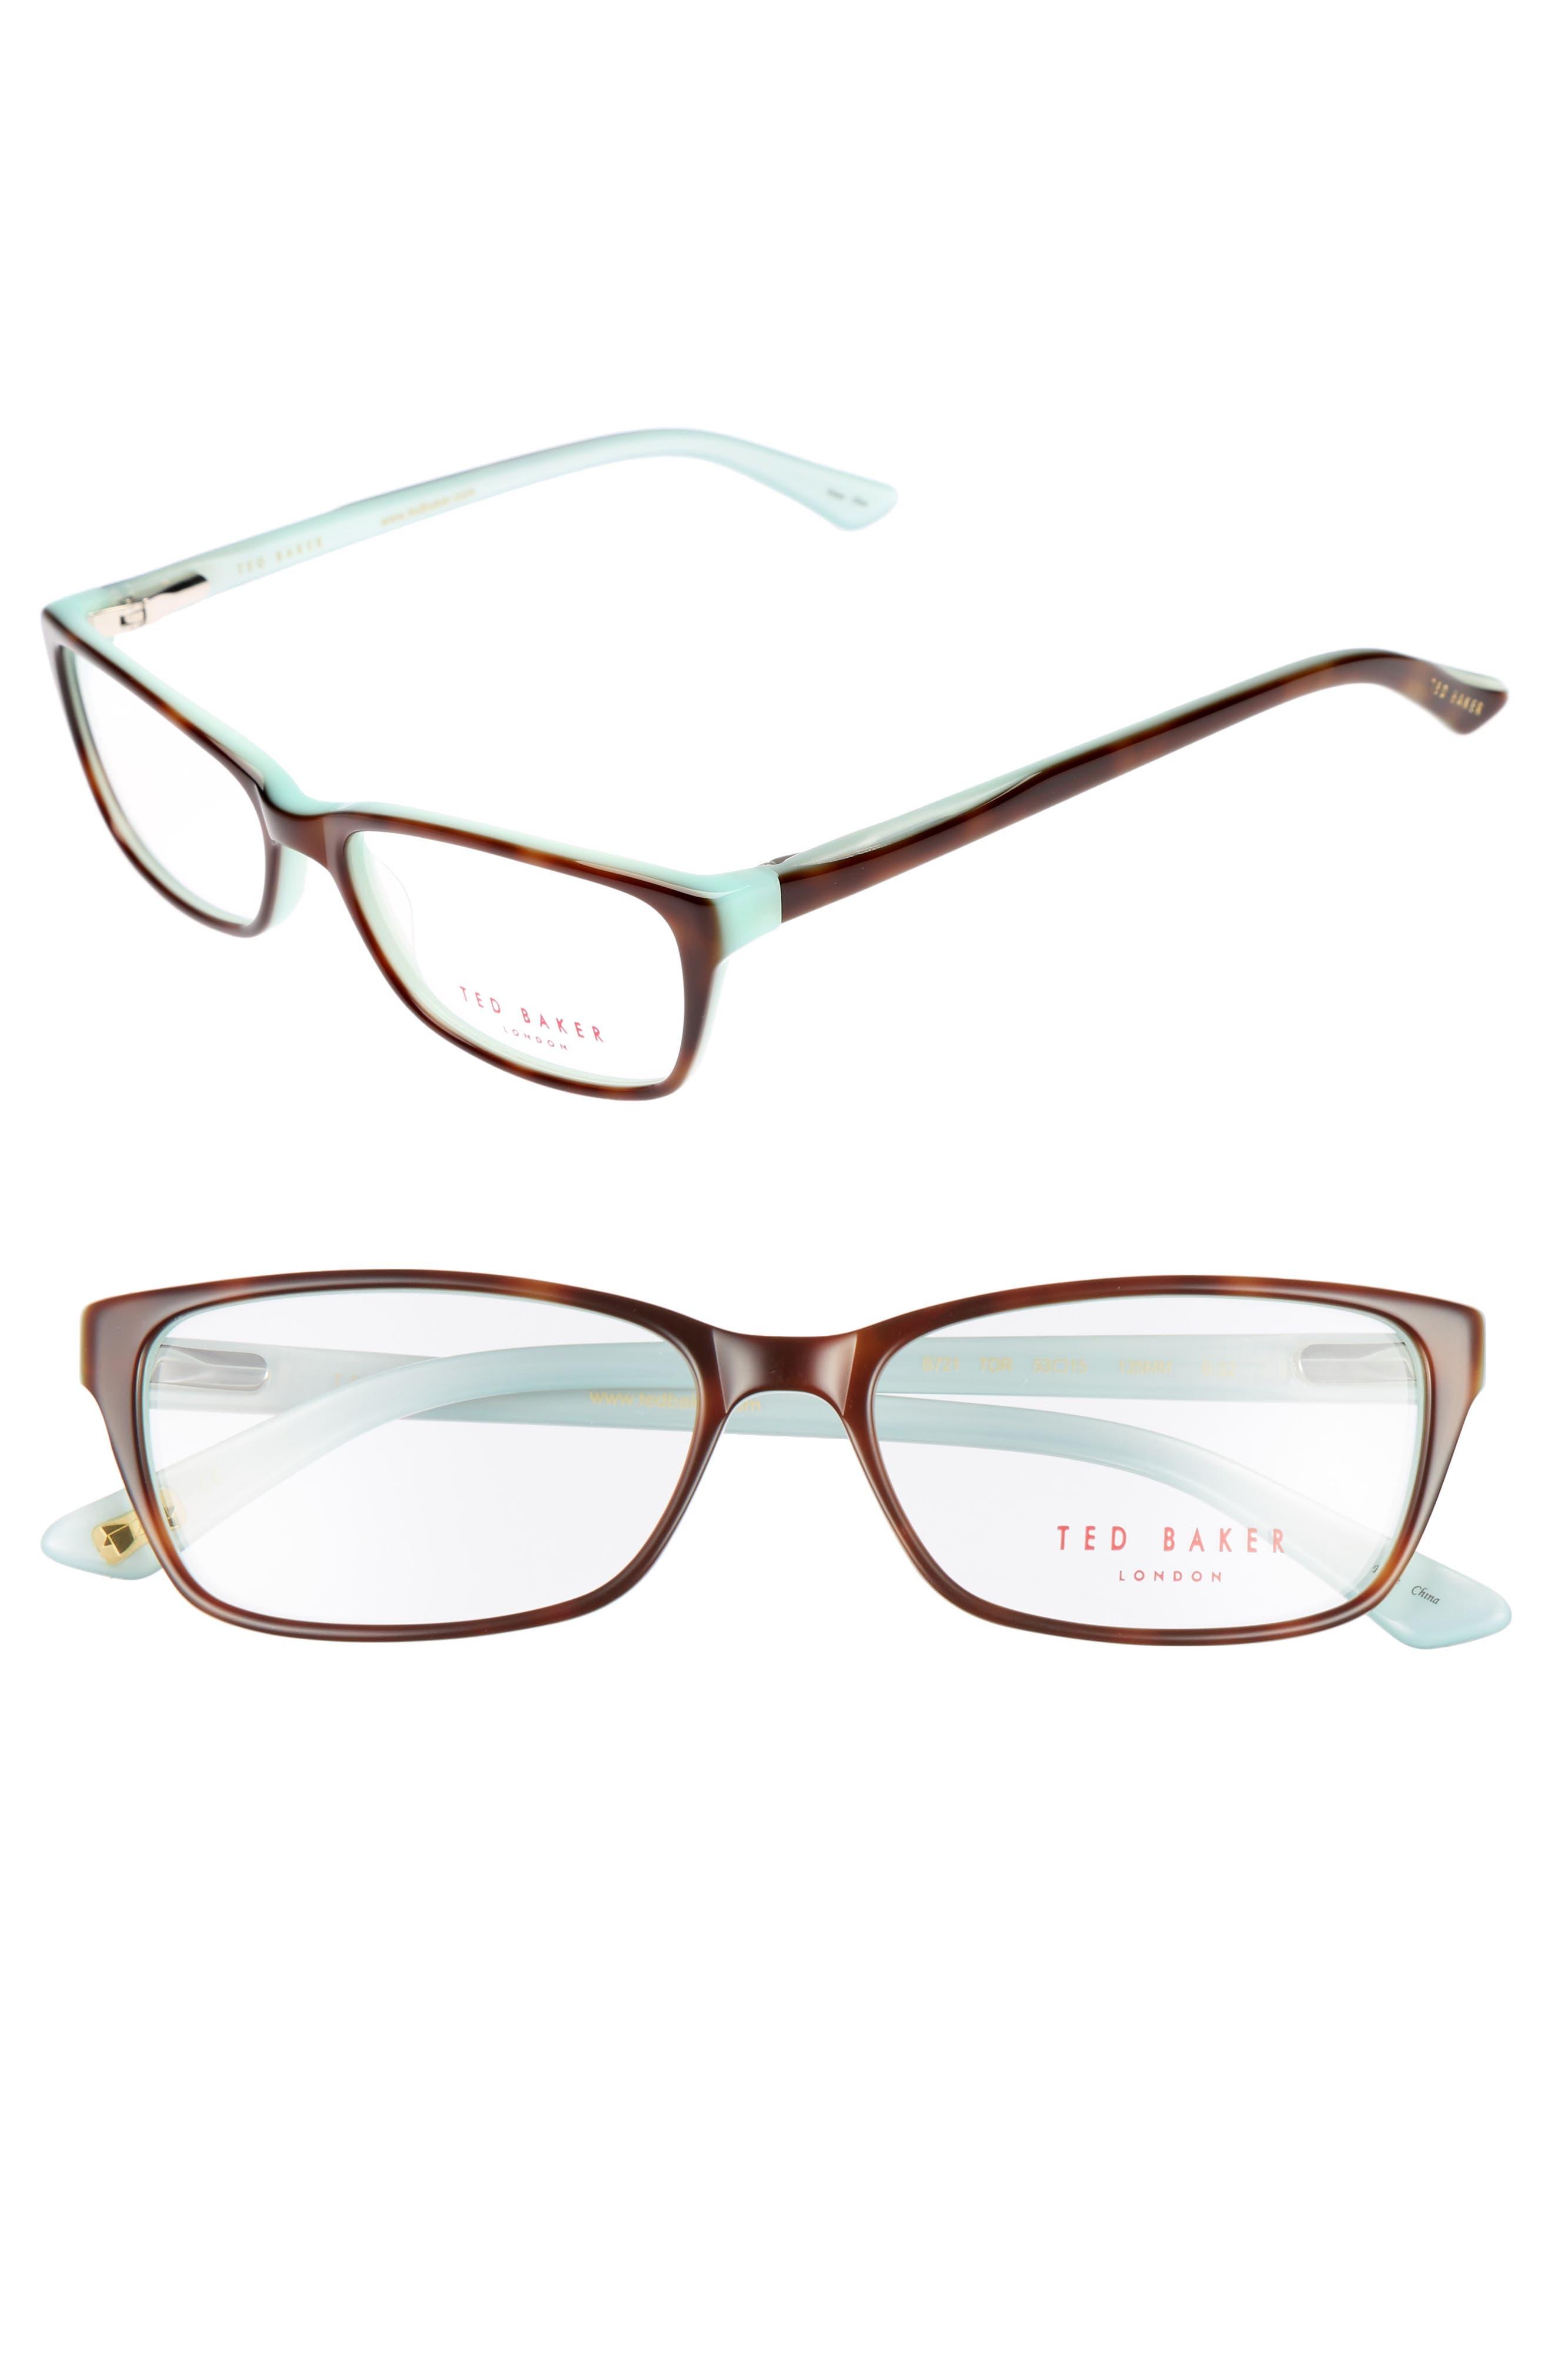 53mm Optical Glasses,                         Main,                         color, Brown